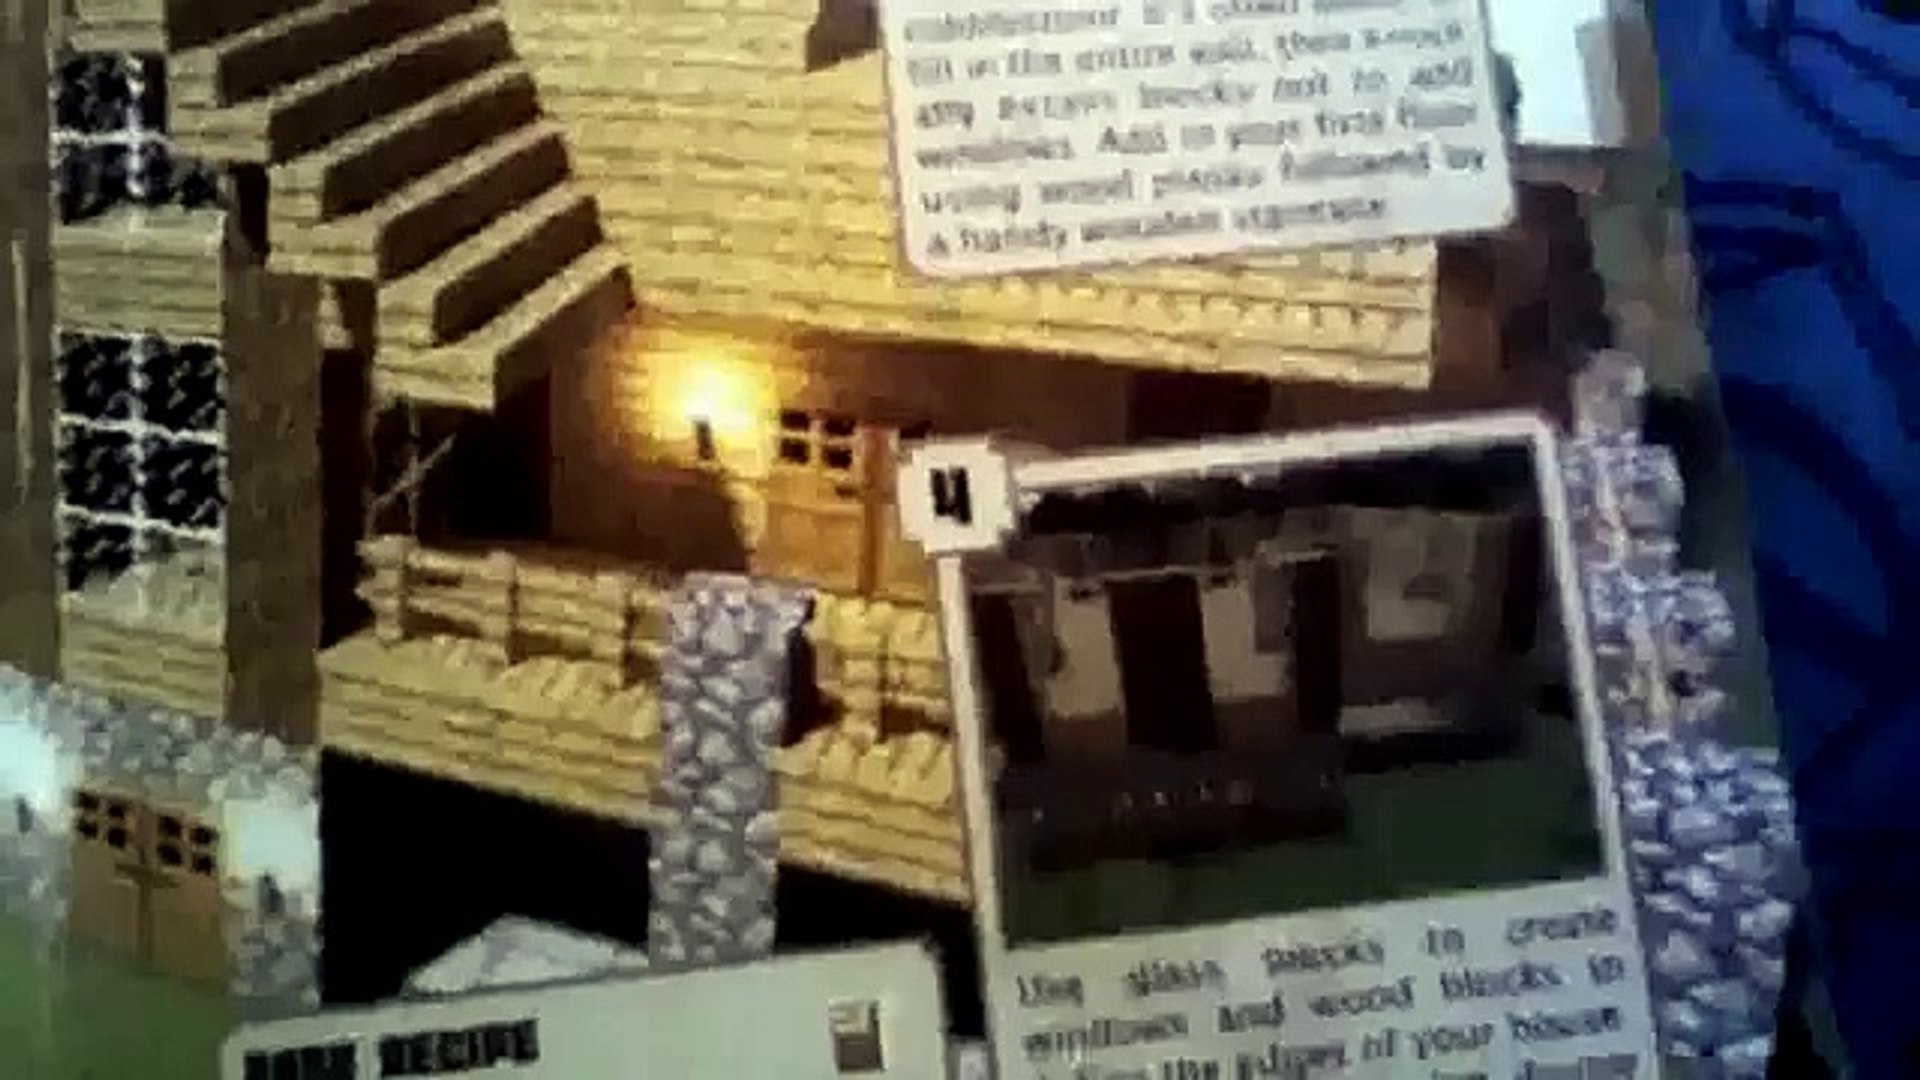 Minecraft Construction Handbook: Wooden House Tutorial - video